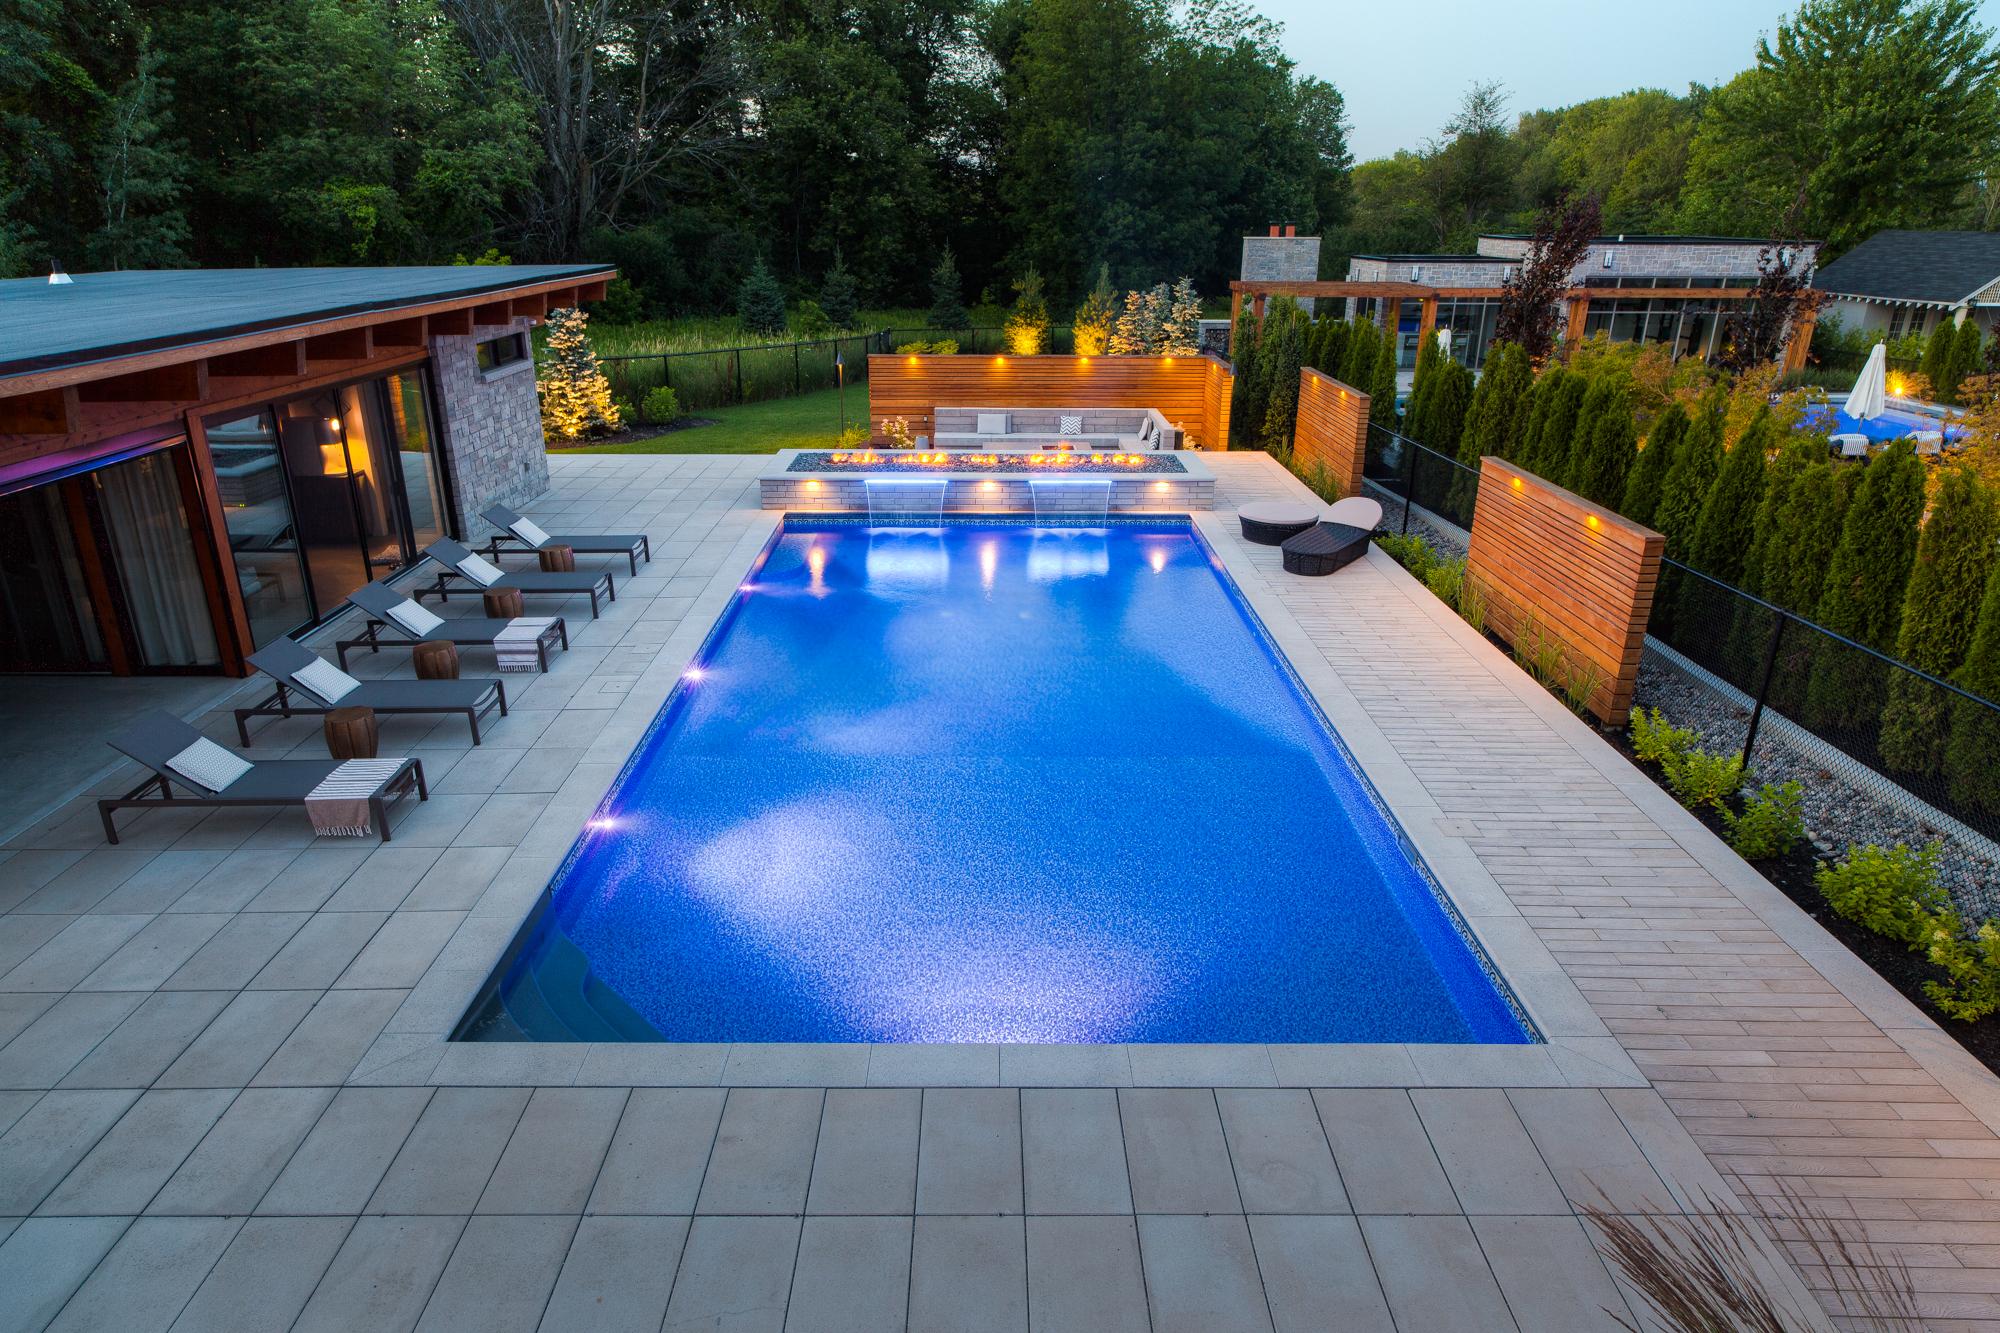 Backyard swimming pool built by a professional pool company